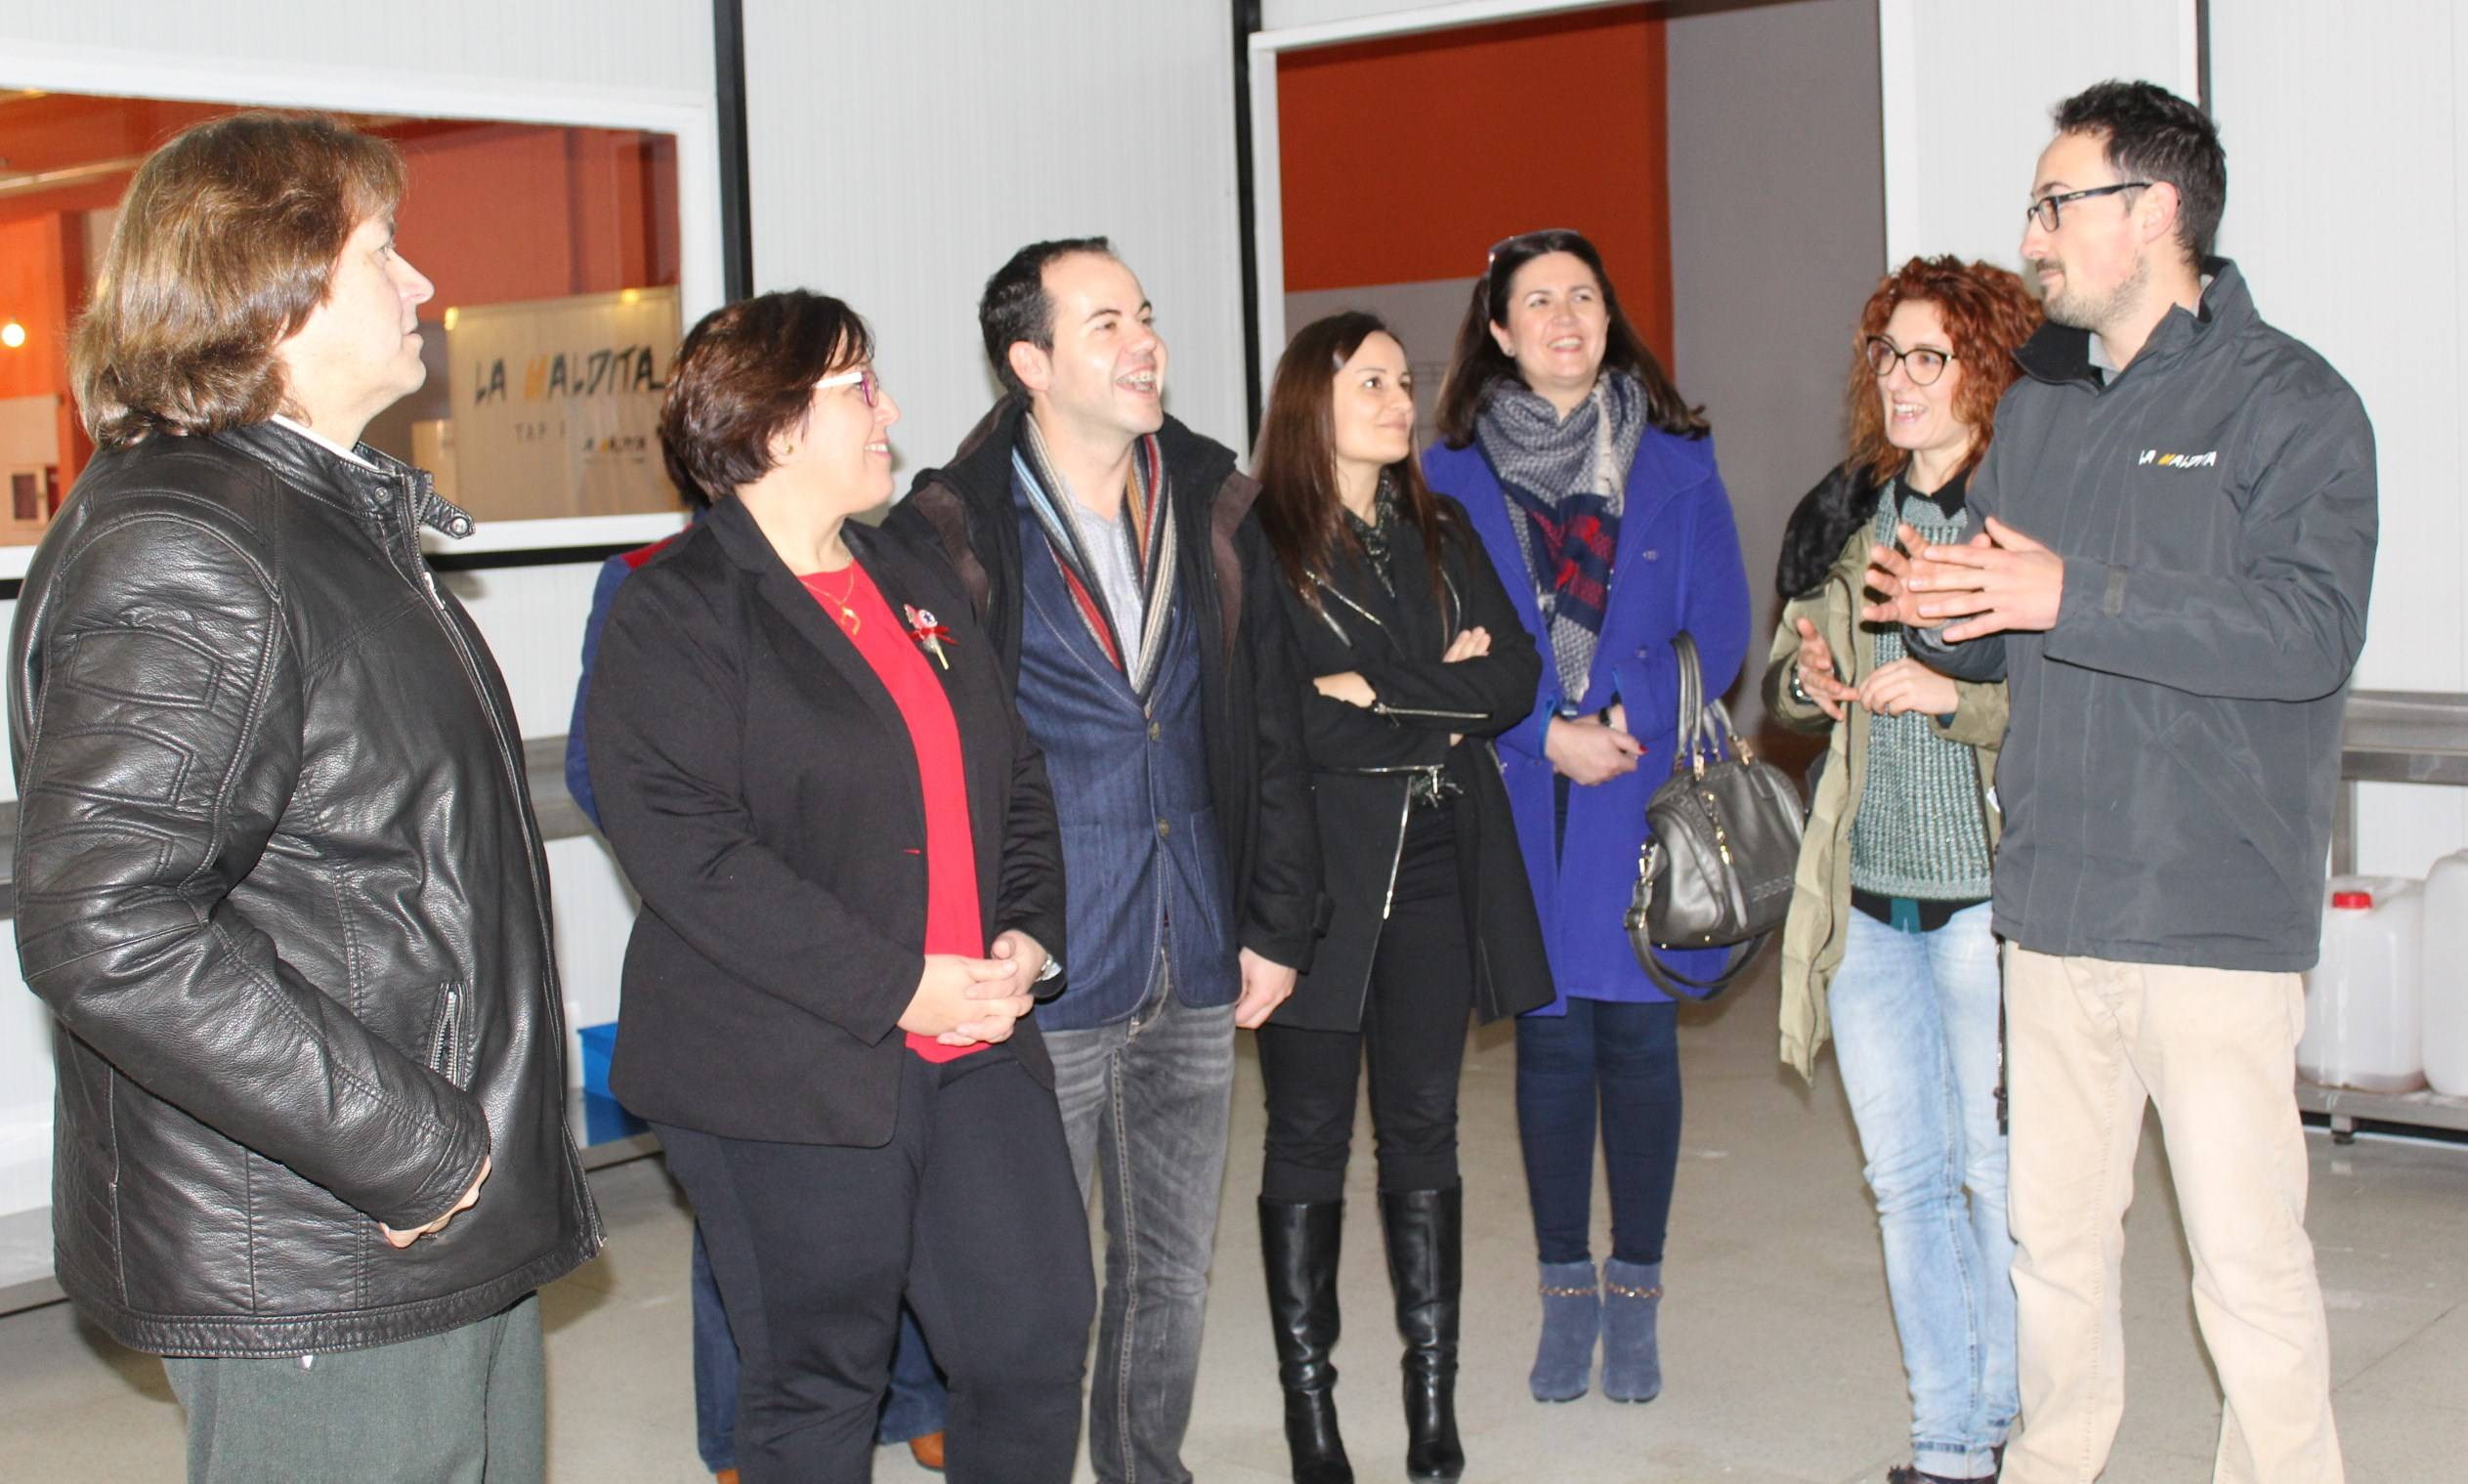 Carmen Olmedo visita cerveza La Maldita 2 - Olmedo visita La Maldita y hace balance del empleo regional